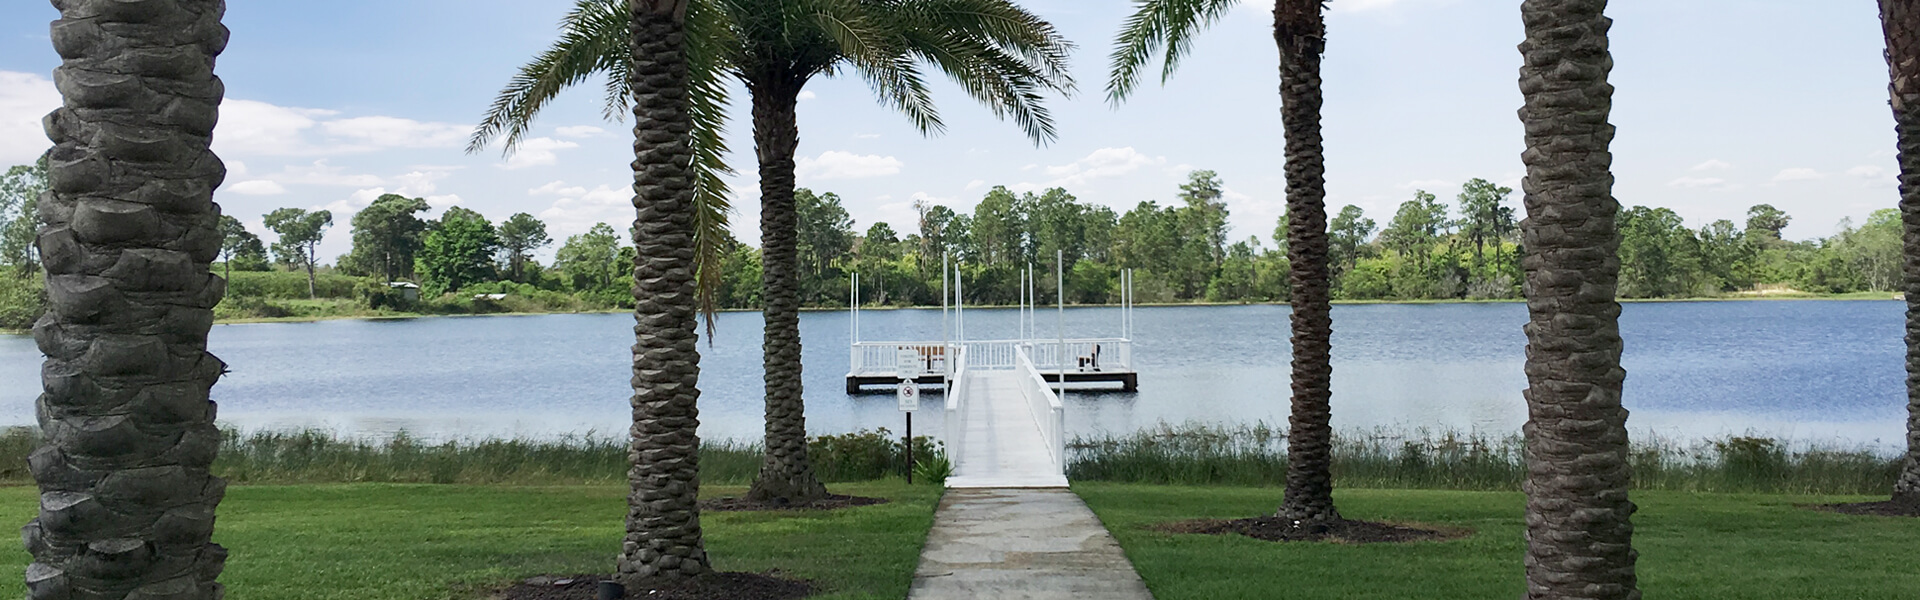 Reflections on Silver Lake | Avon Park FL | Mobile Home ...